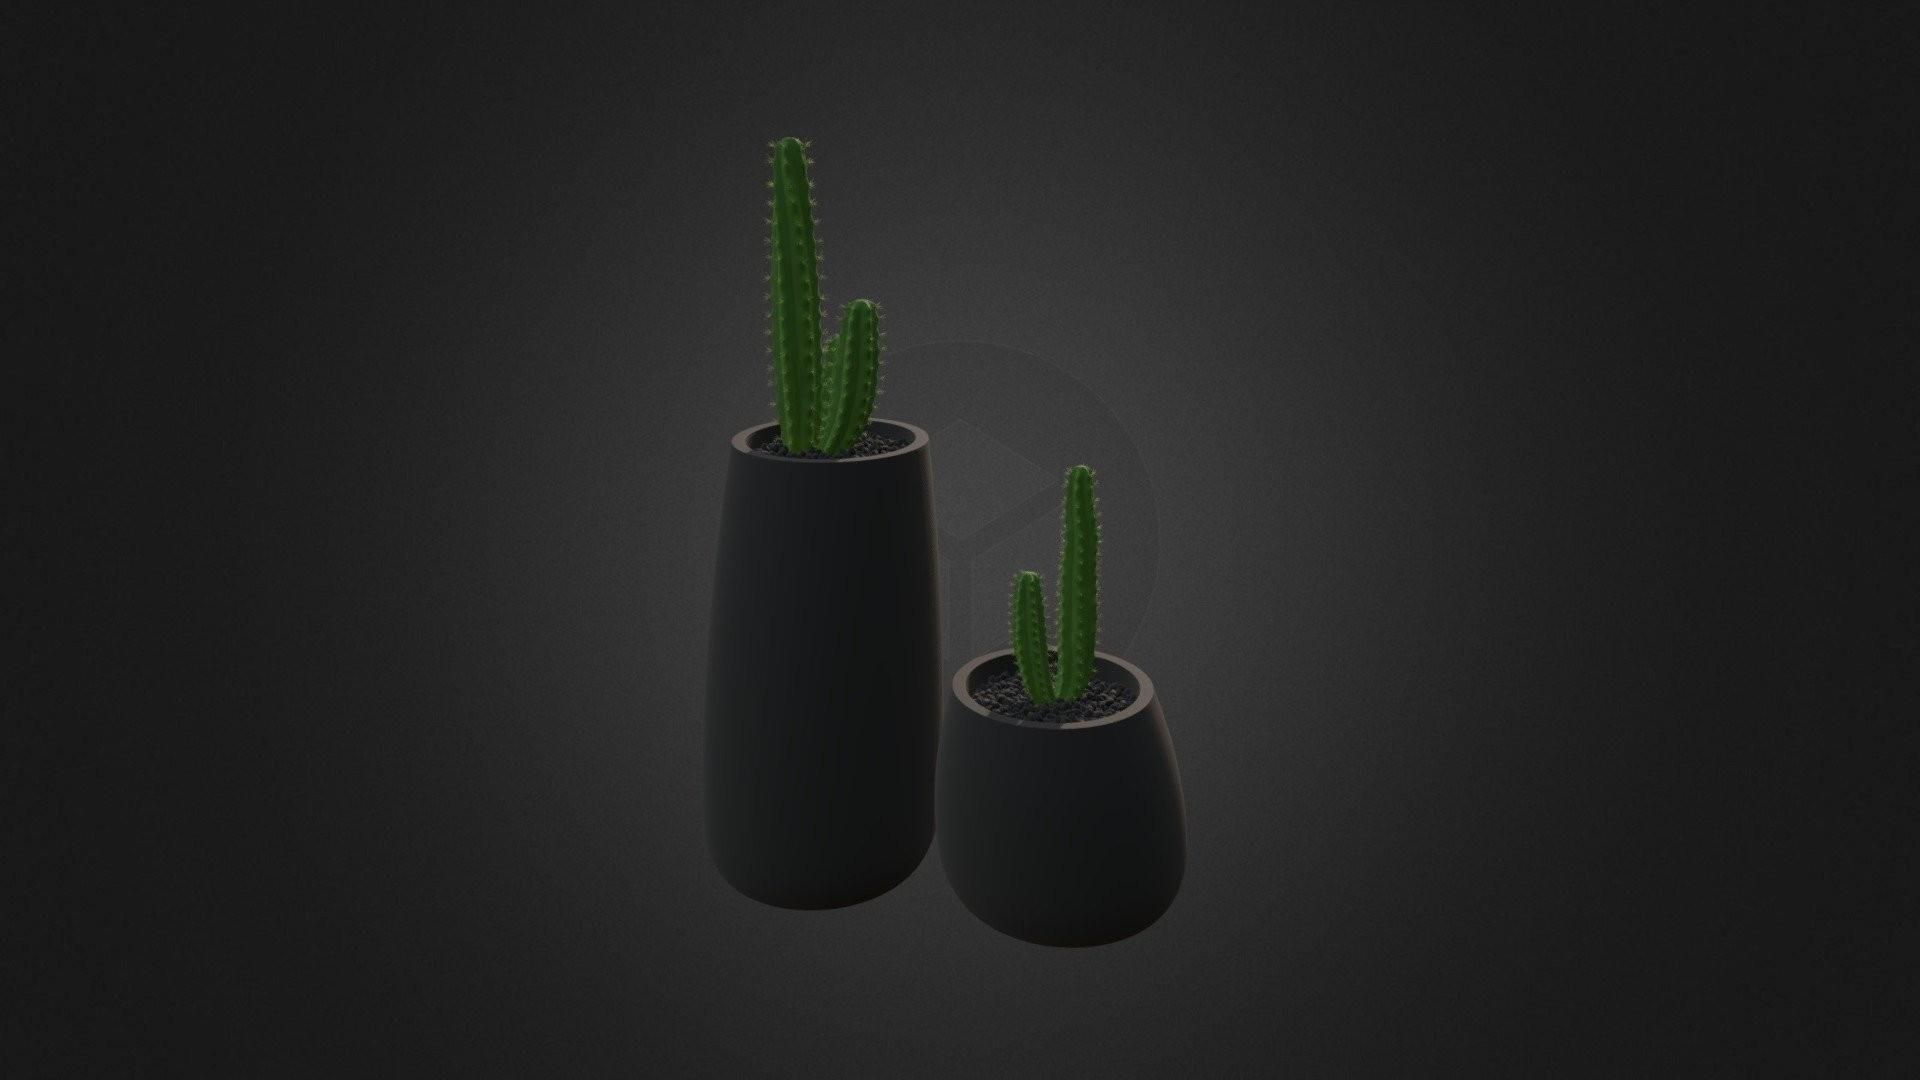 Cactus Minimalist Wallpaper theme